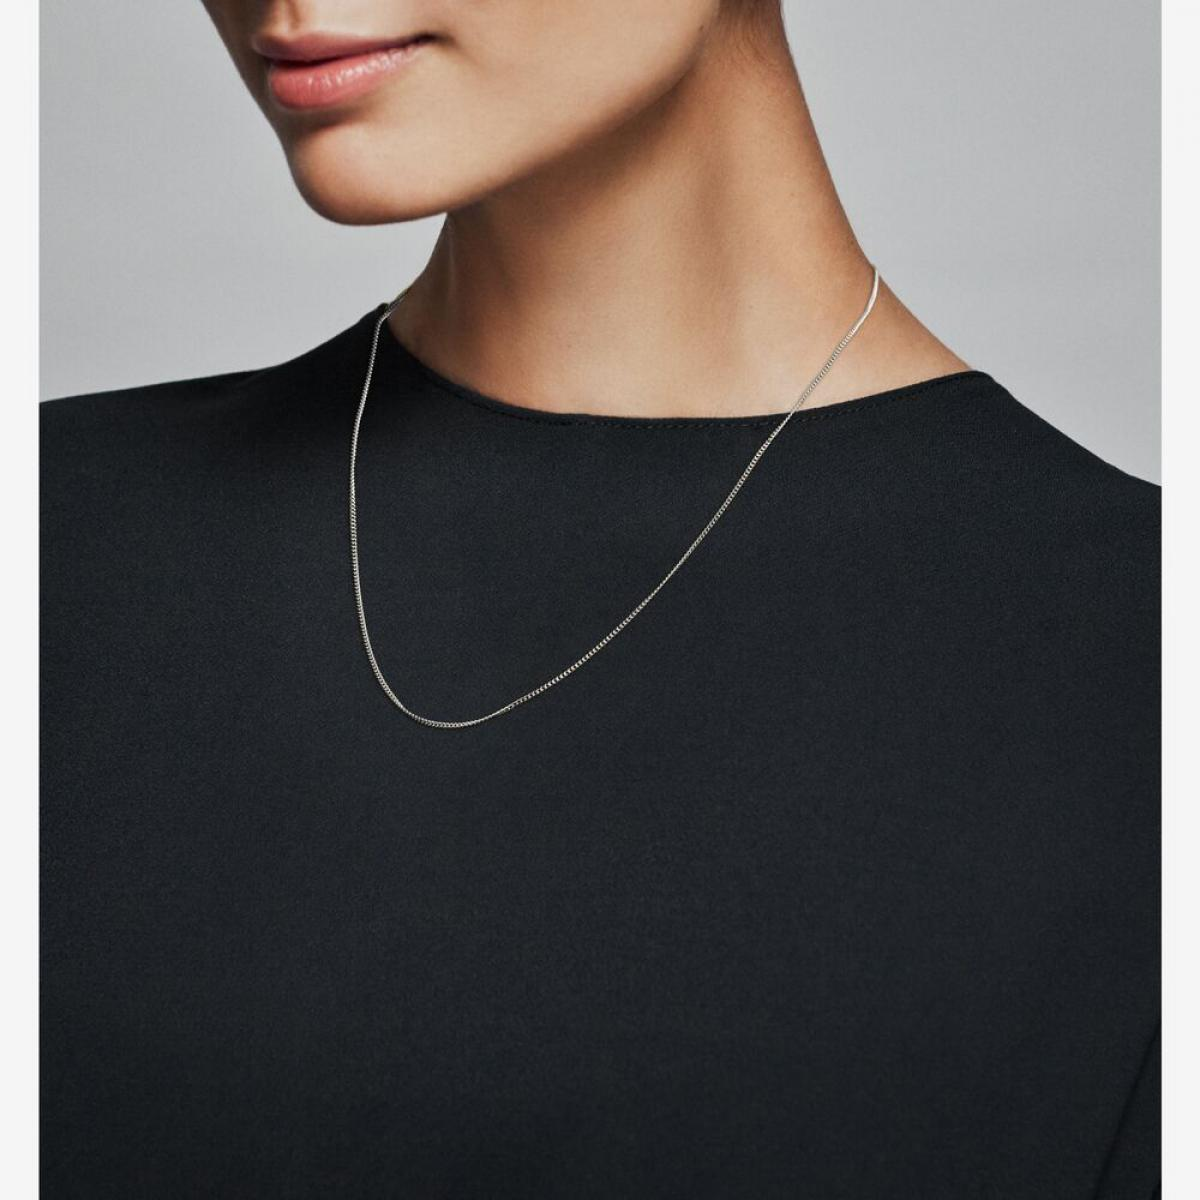 collier femme argent pandora